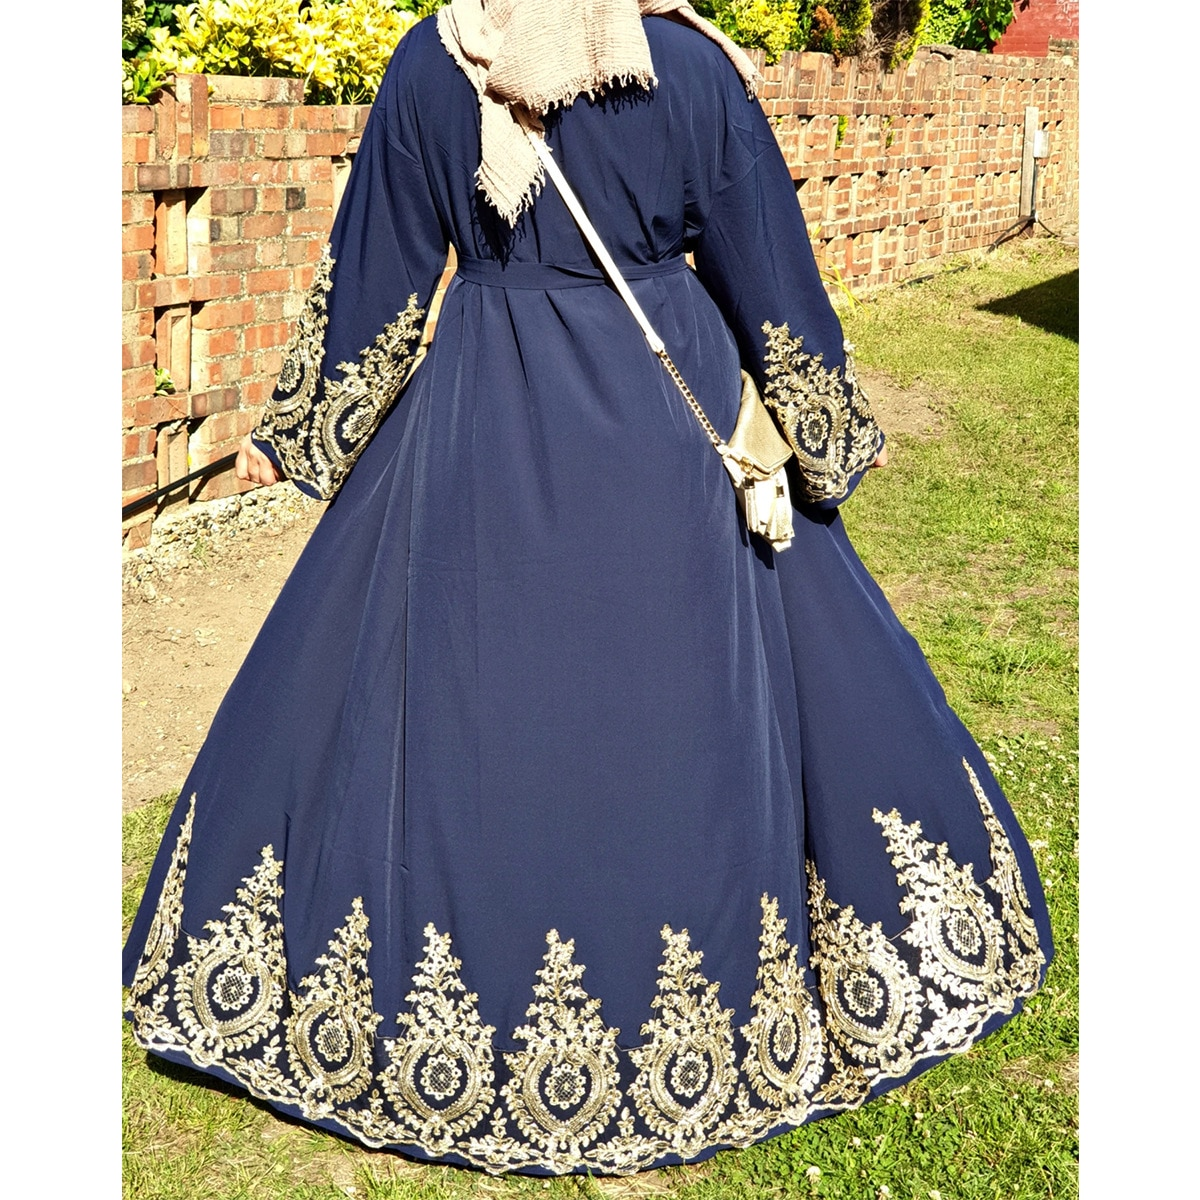 WEPBEL-فستان نسائي مسلم ، أكمام طويلة ، طباعة الأزهار ، كارديجان ، أزياء مفتوحة ، عباية دبي ، طول الكاحل